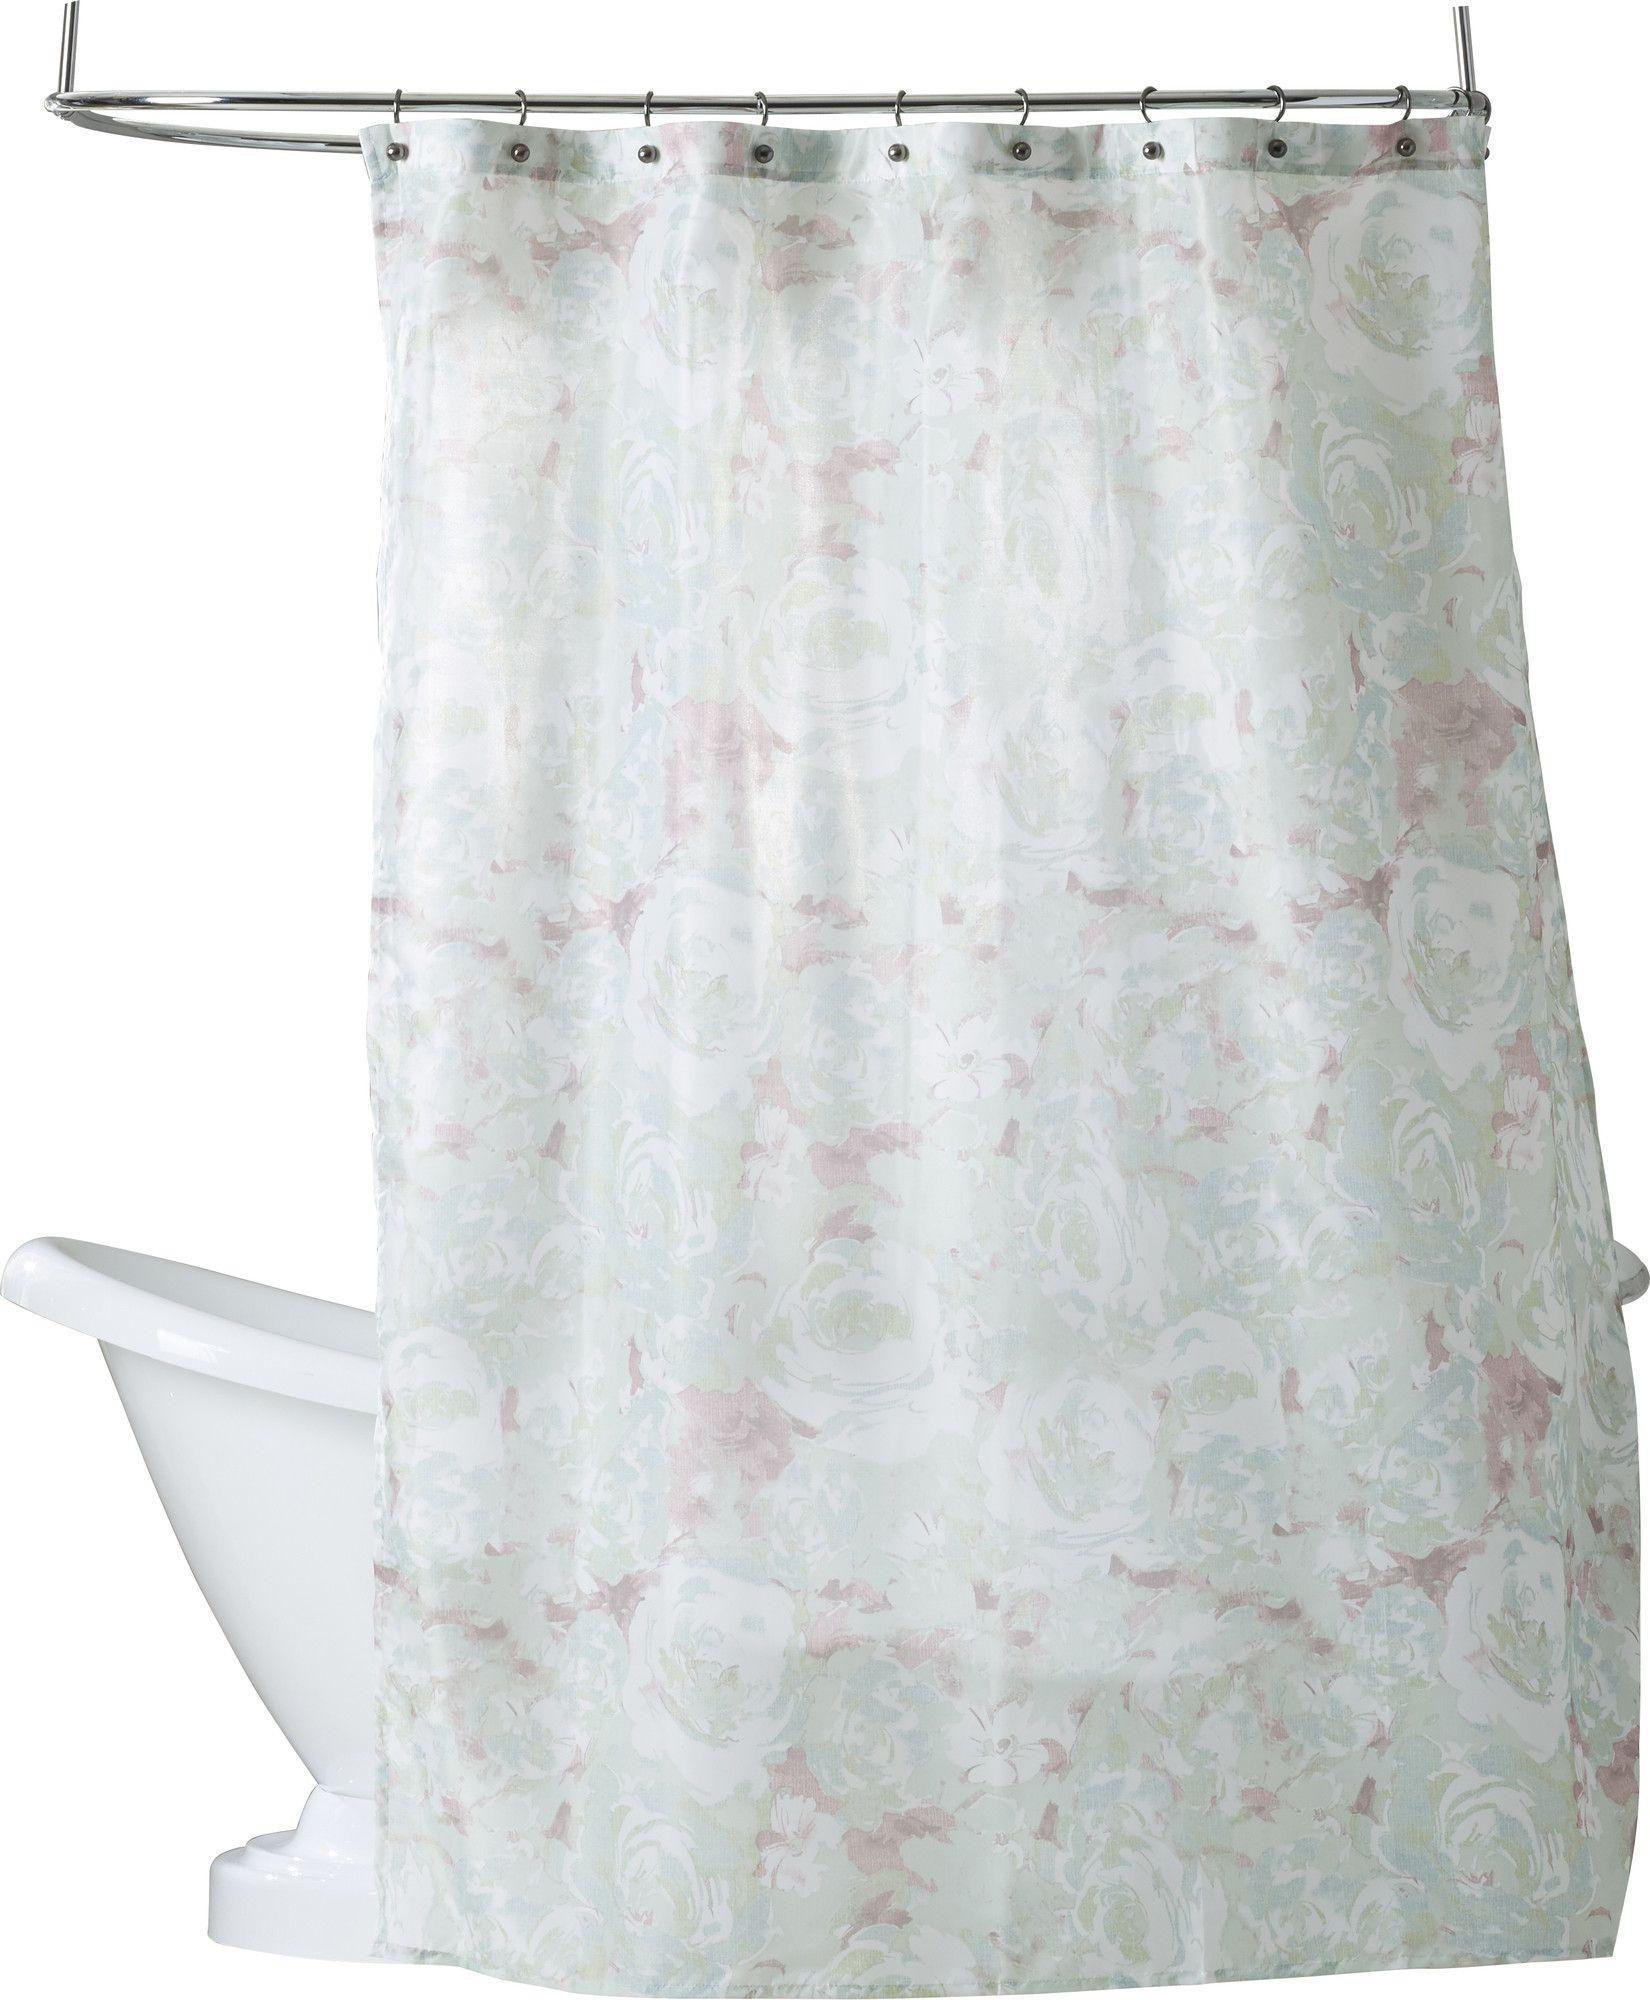 Murphey Polyester Shower Curtain Set